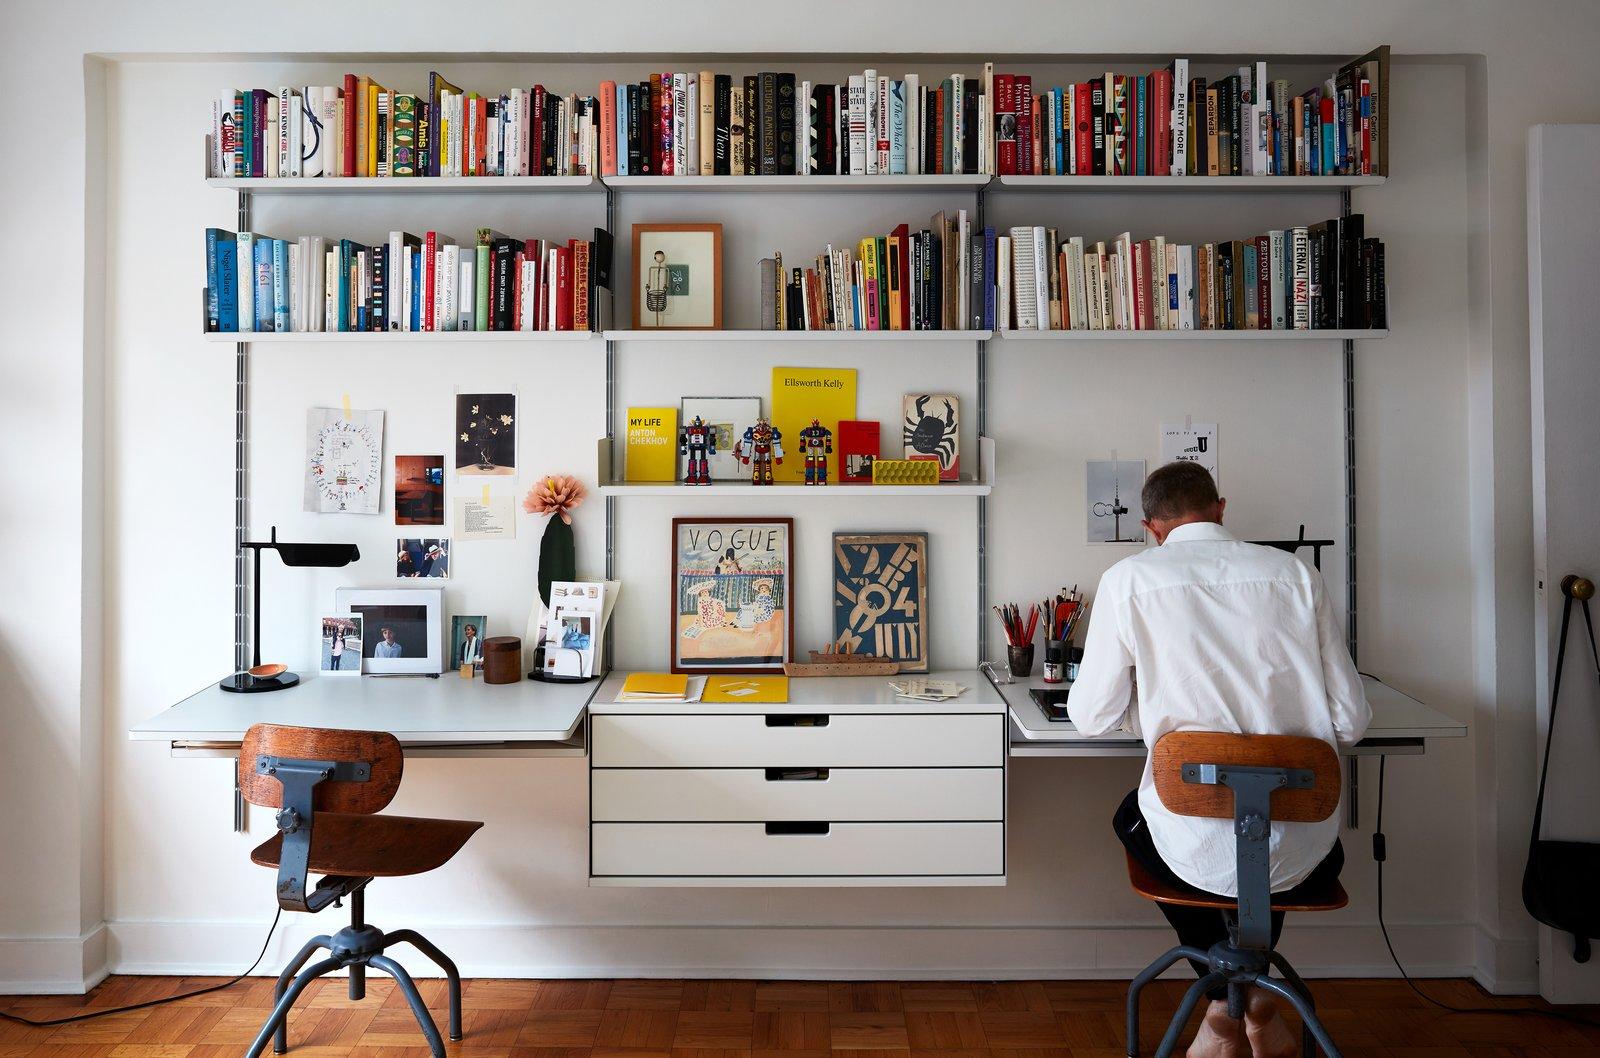 Nicholas Blechman and Luise Stauss home office